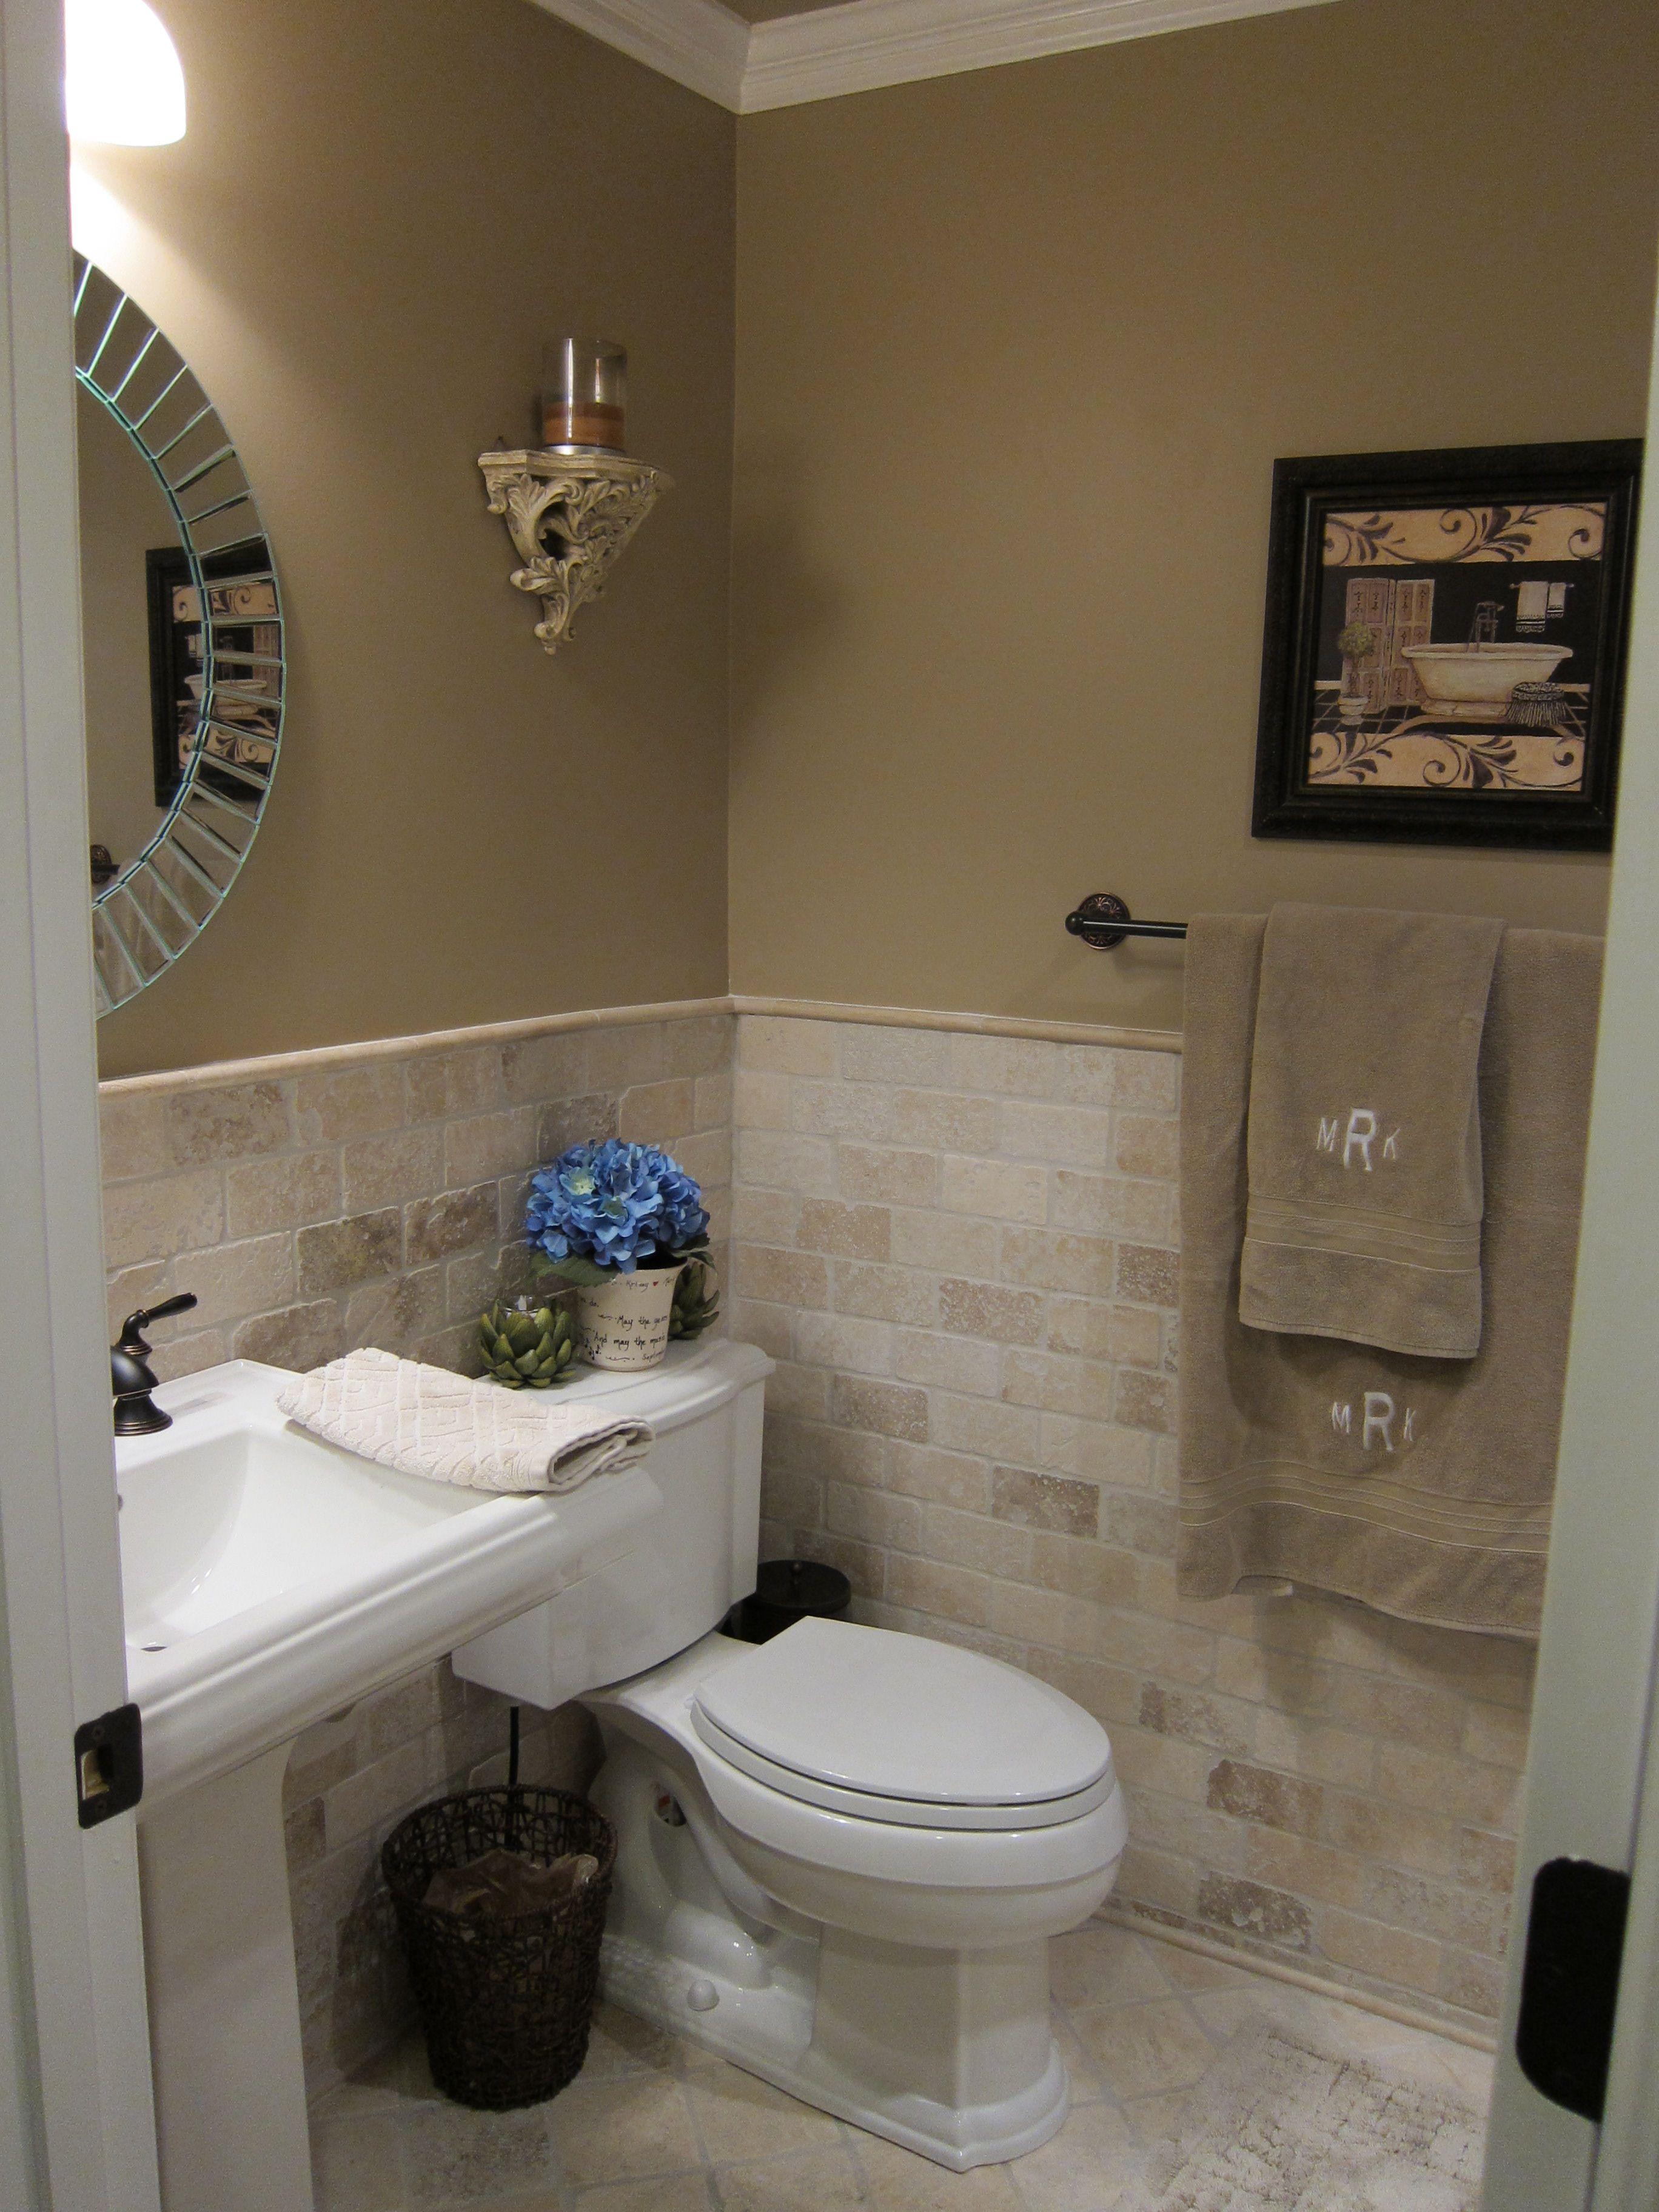 26 half bathroom ideas and design for upgrade your house - Half bathroom remodel ideas ...